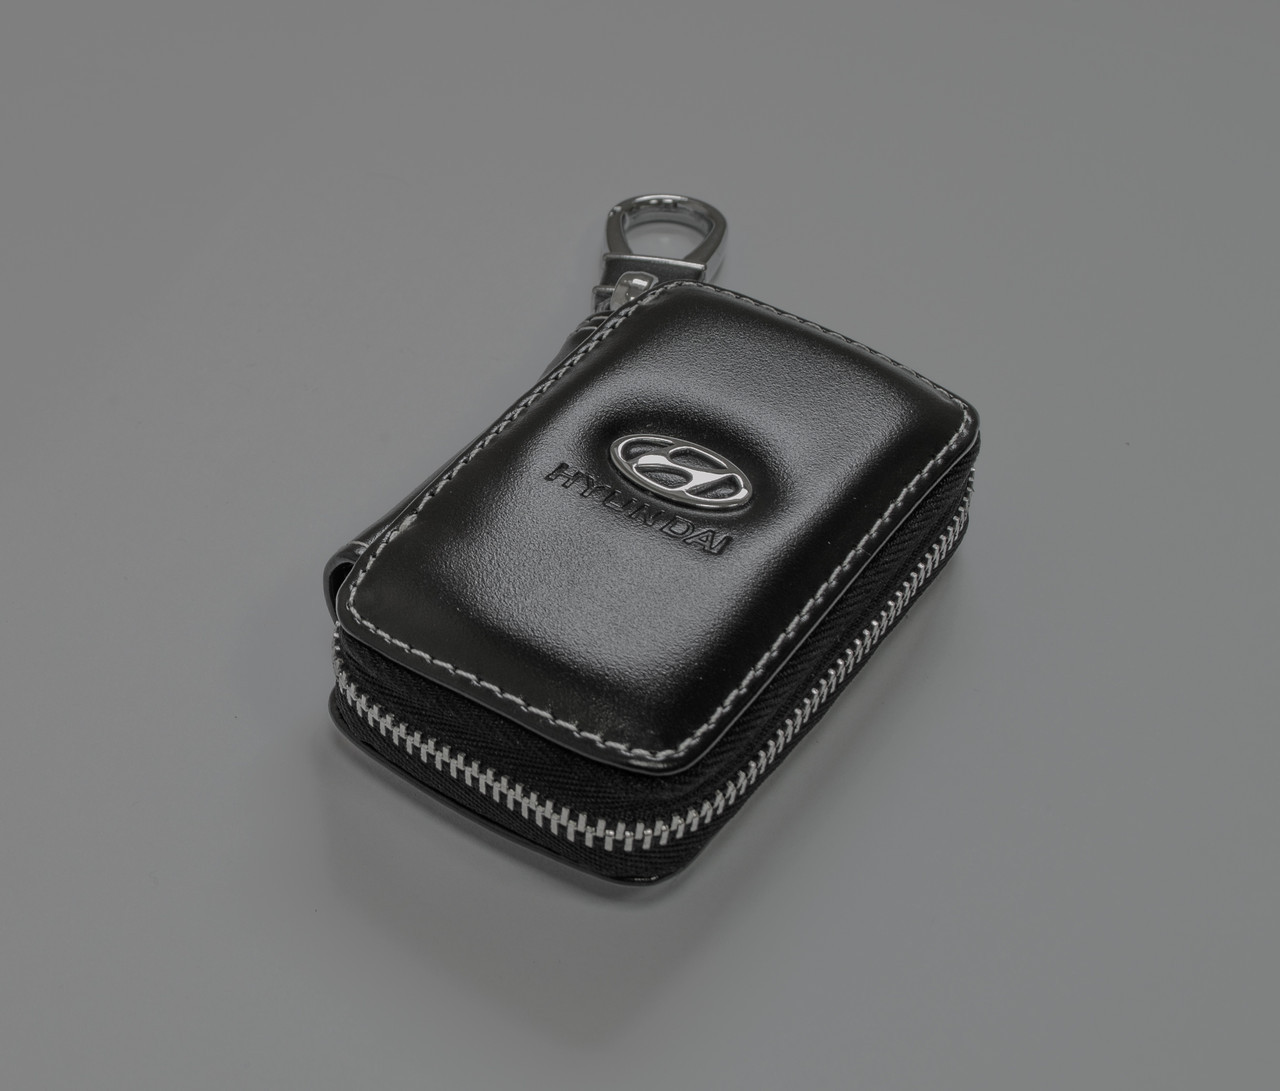 Ключница Carss с логотипом HYUNDAI 10011 черная